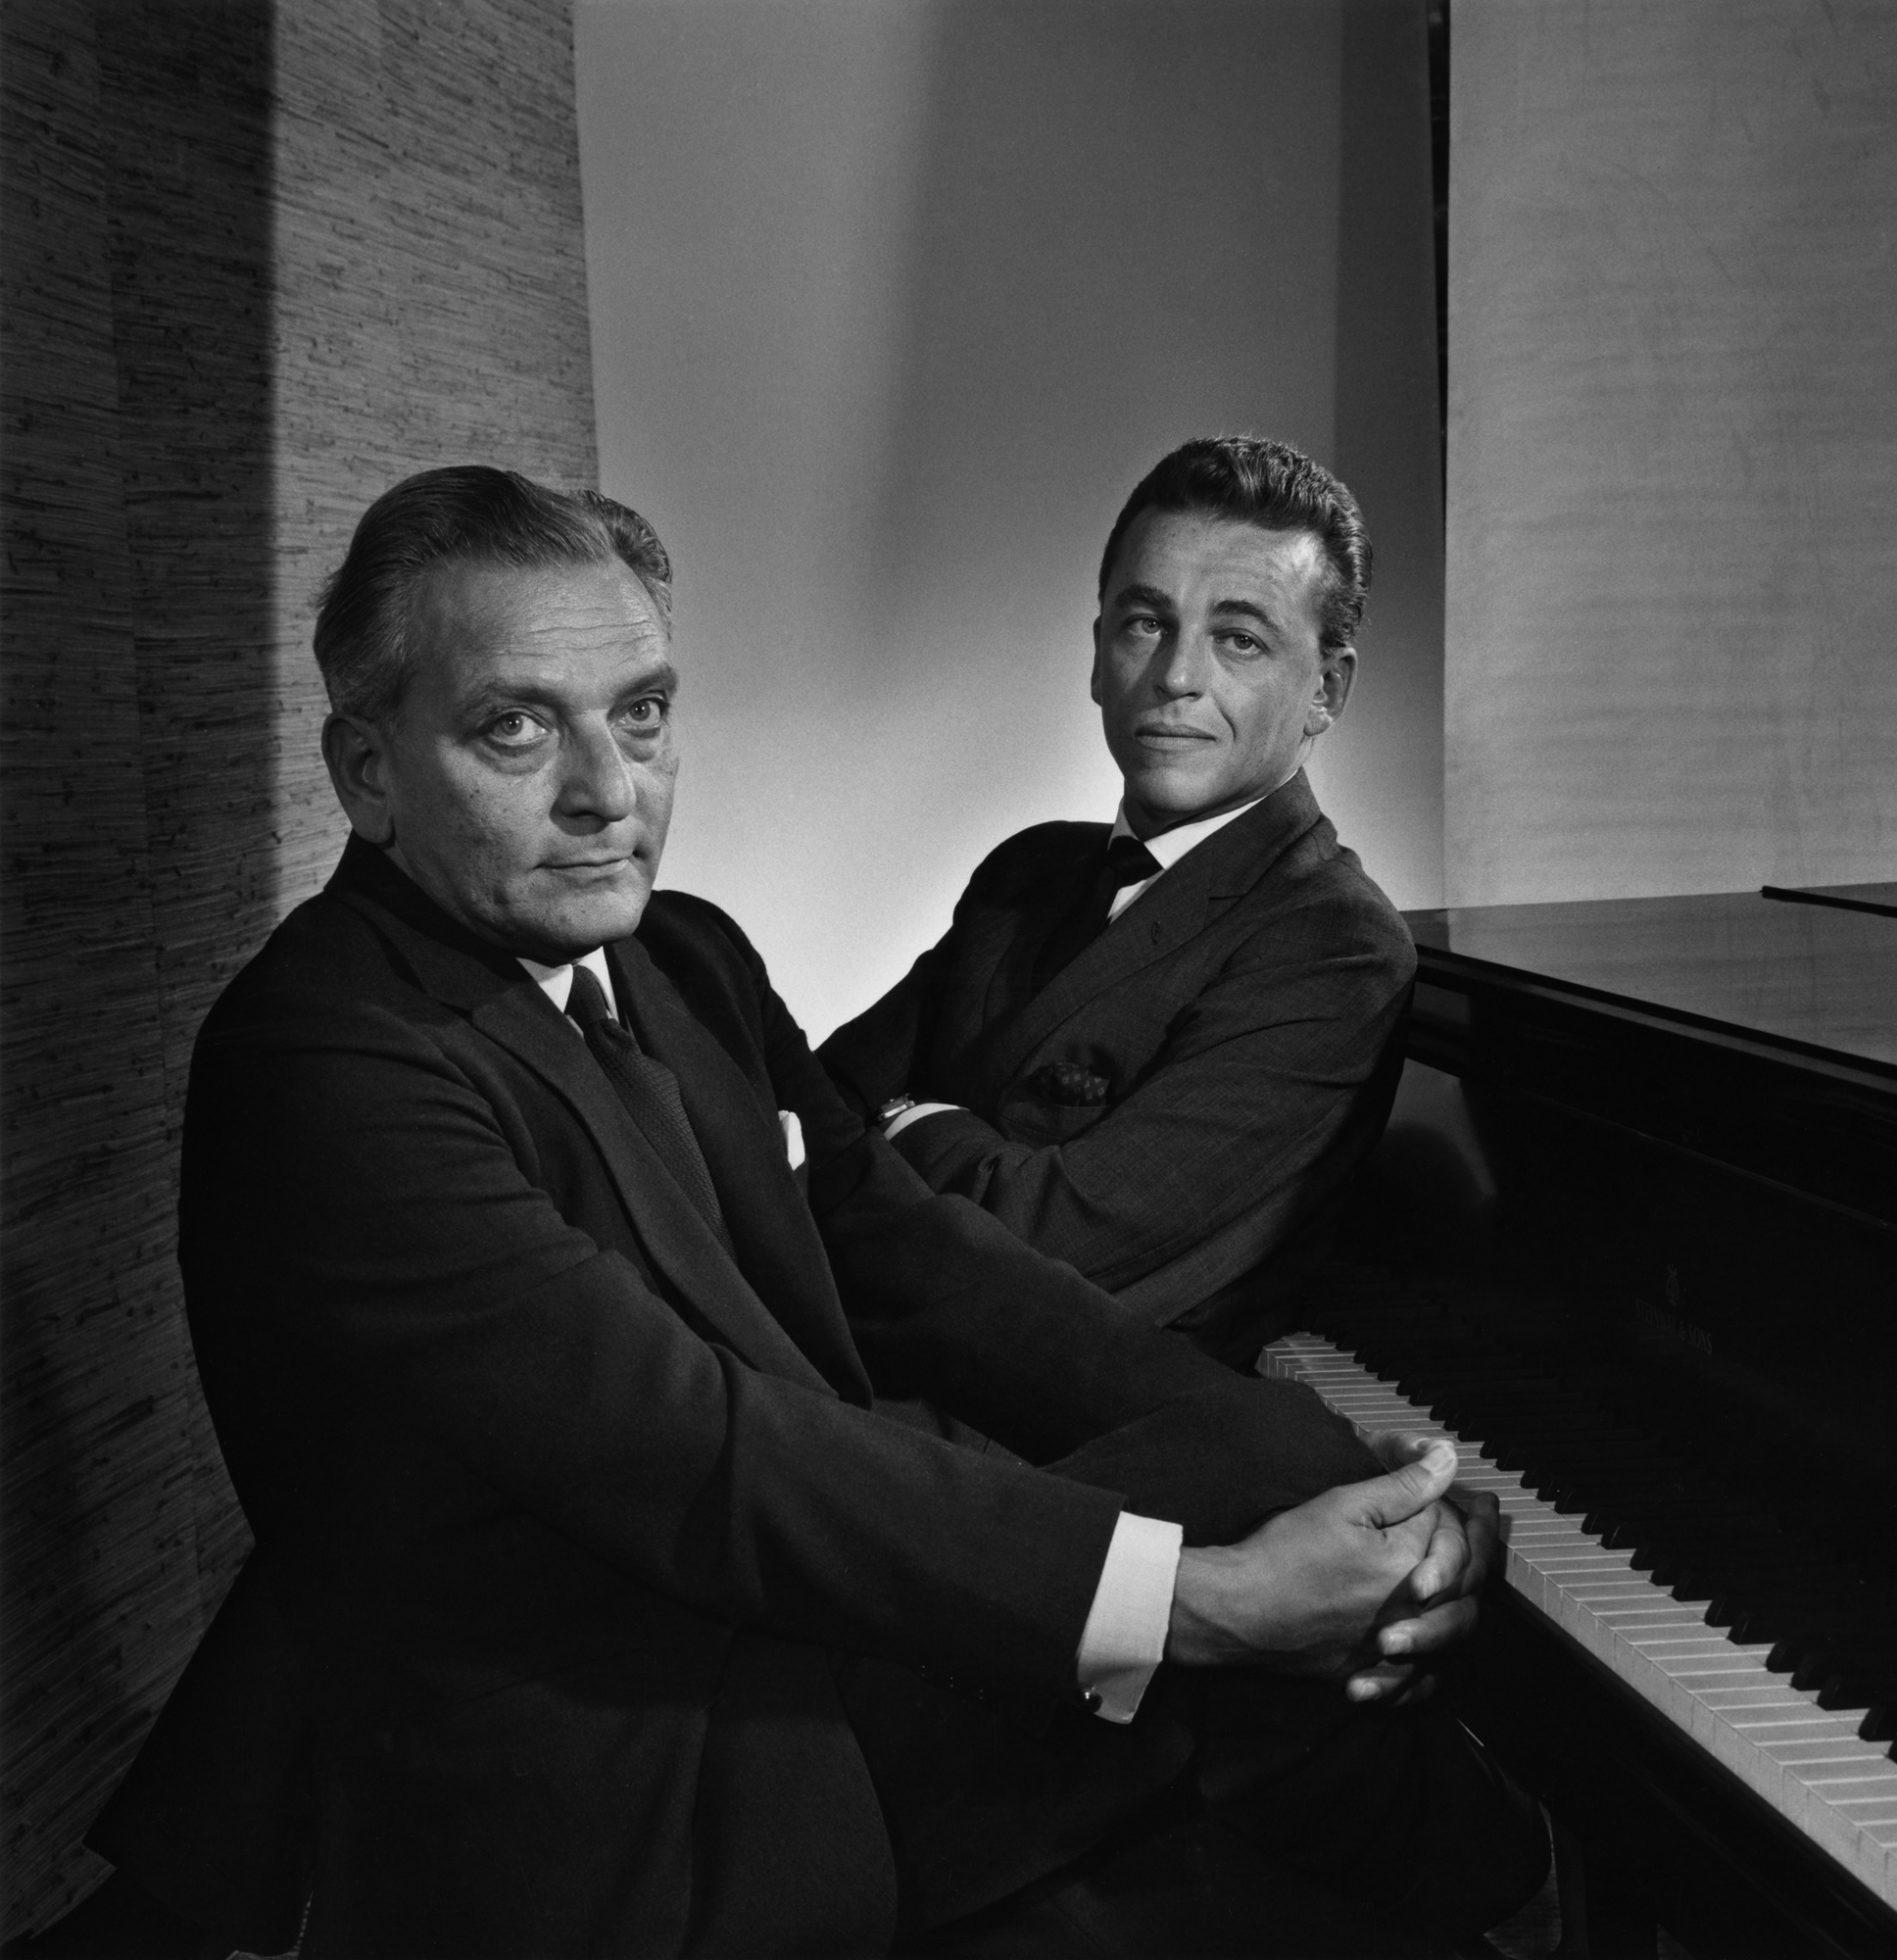 Alan Jay Lerner and Frederick Loewe